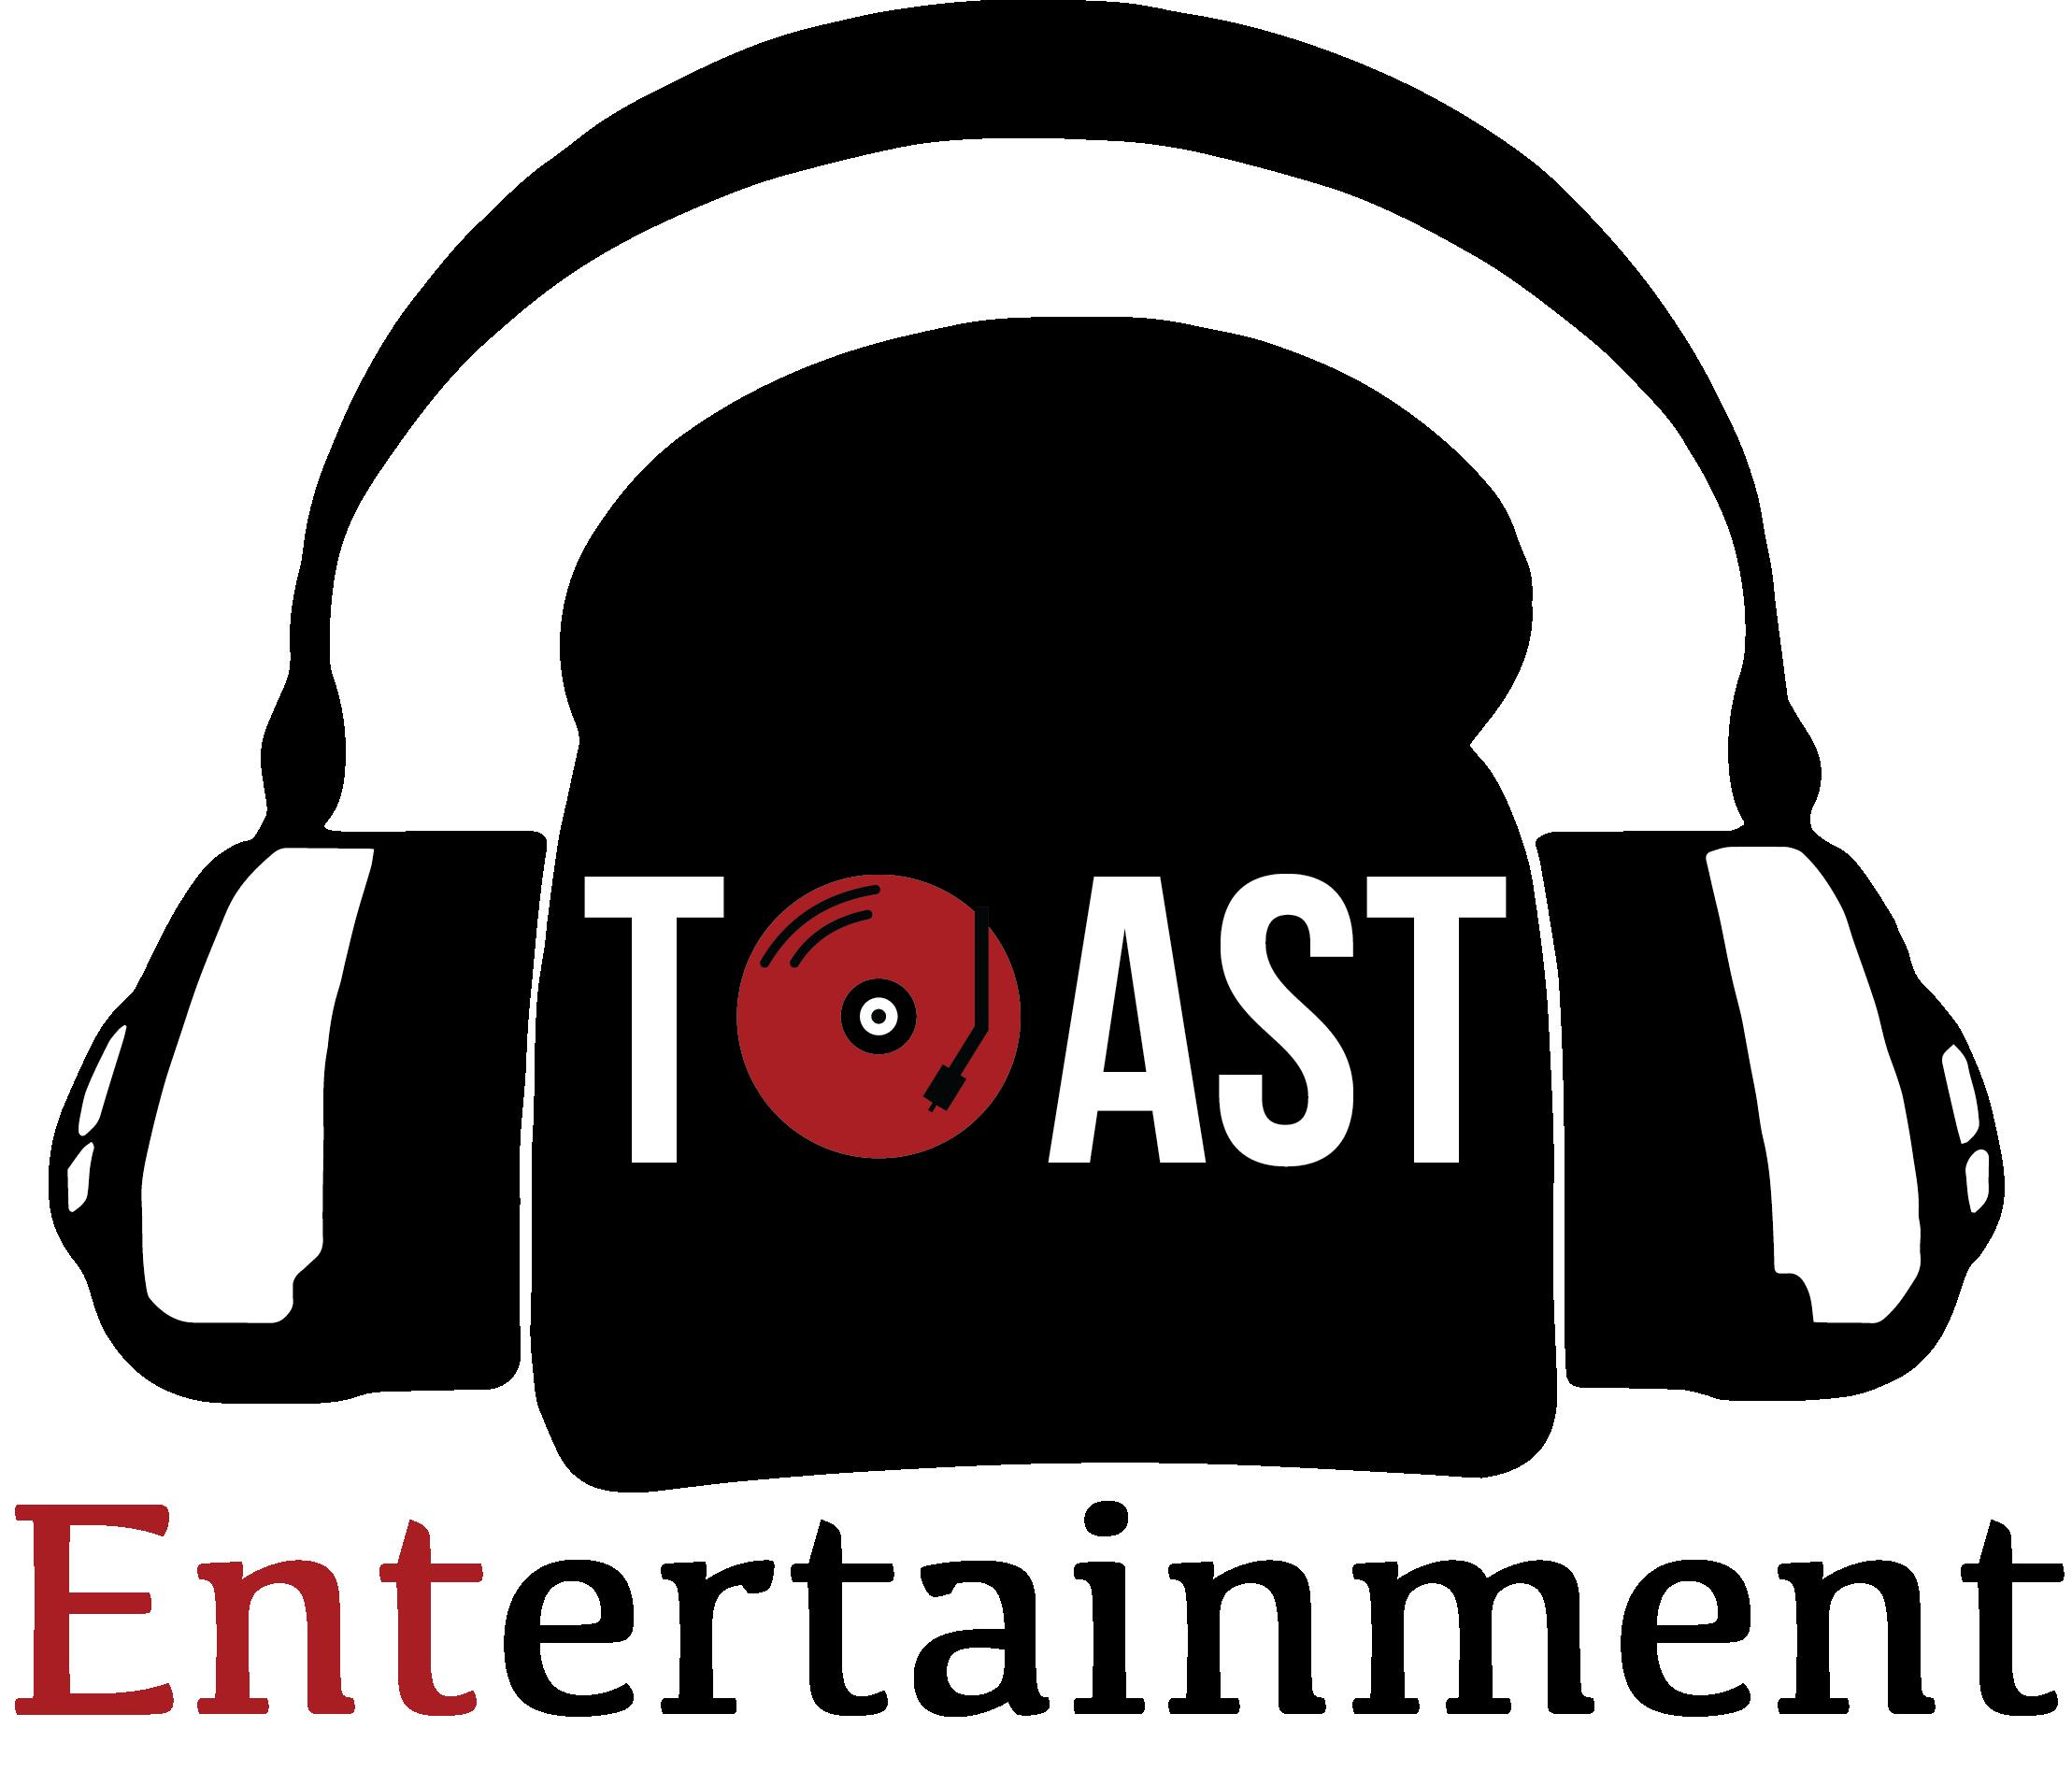 Toast Entertainment New Orleans Logo